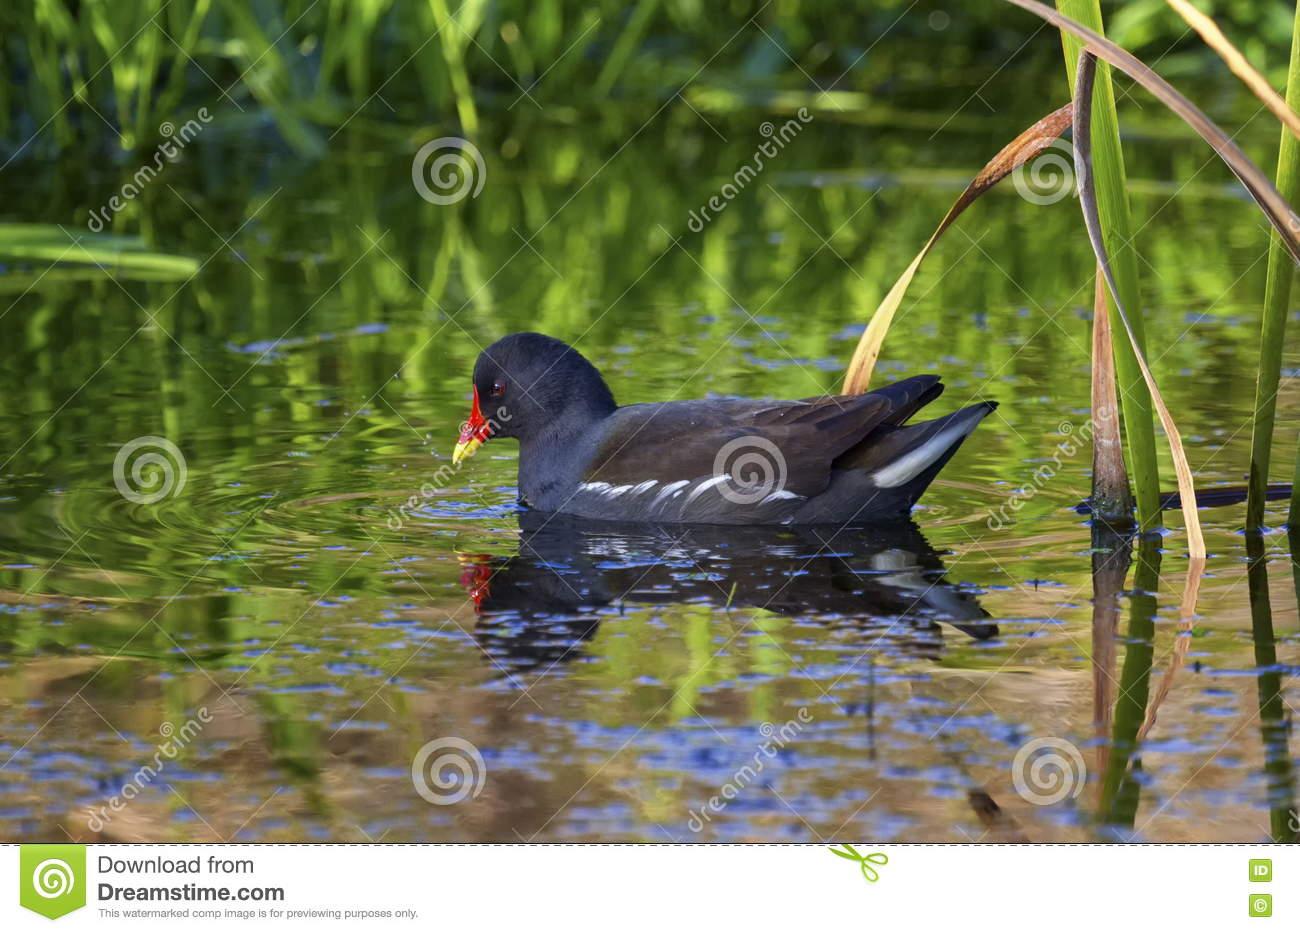 Common Moorhen Or Swamp Chicken, Gallinula Chloropus Stock Photo.